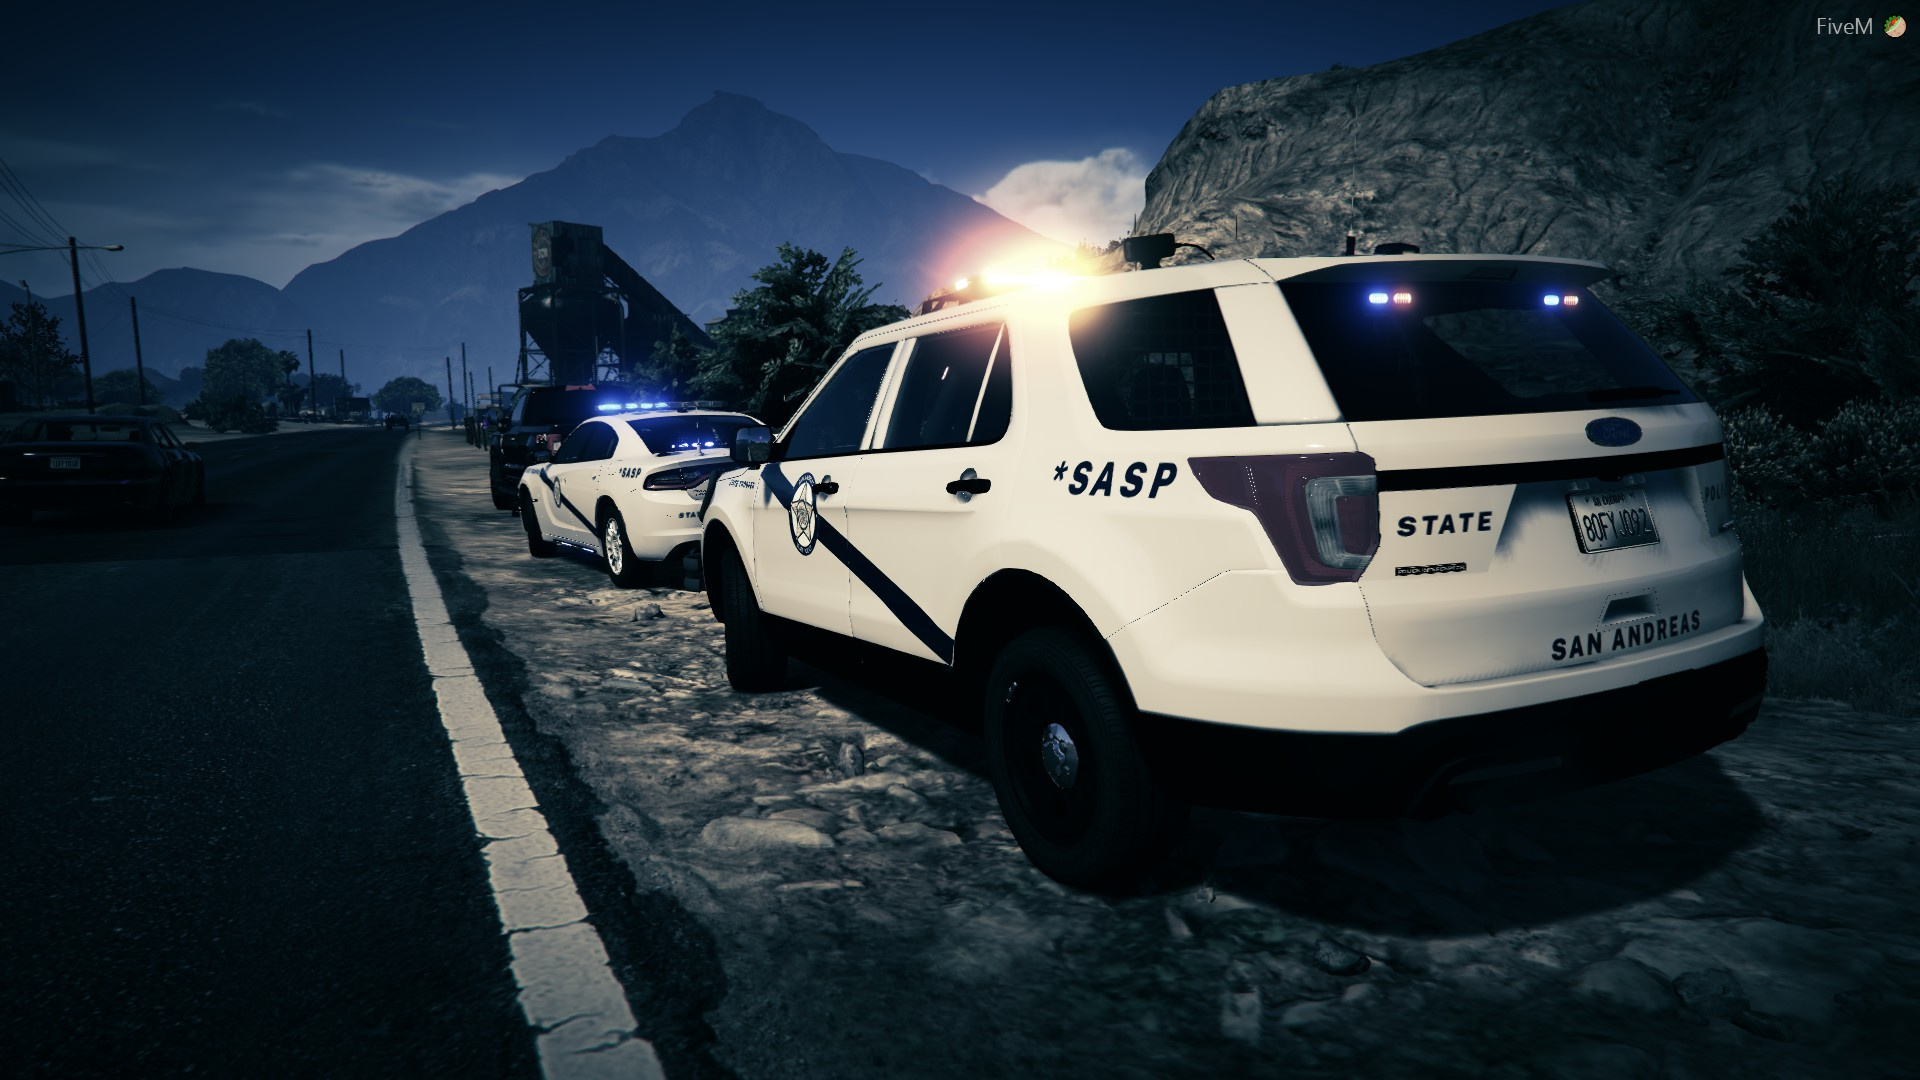 San Andreas State Police Livery [Kentucky Based] - GTA5-Mods com